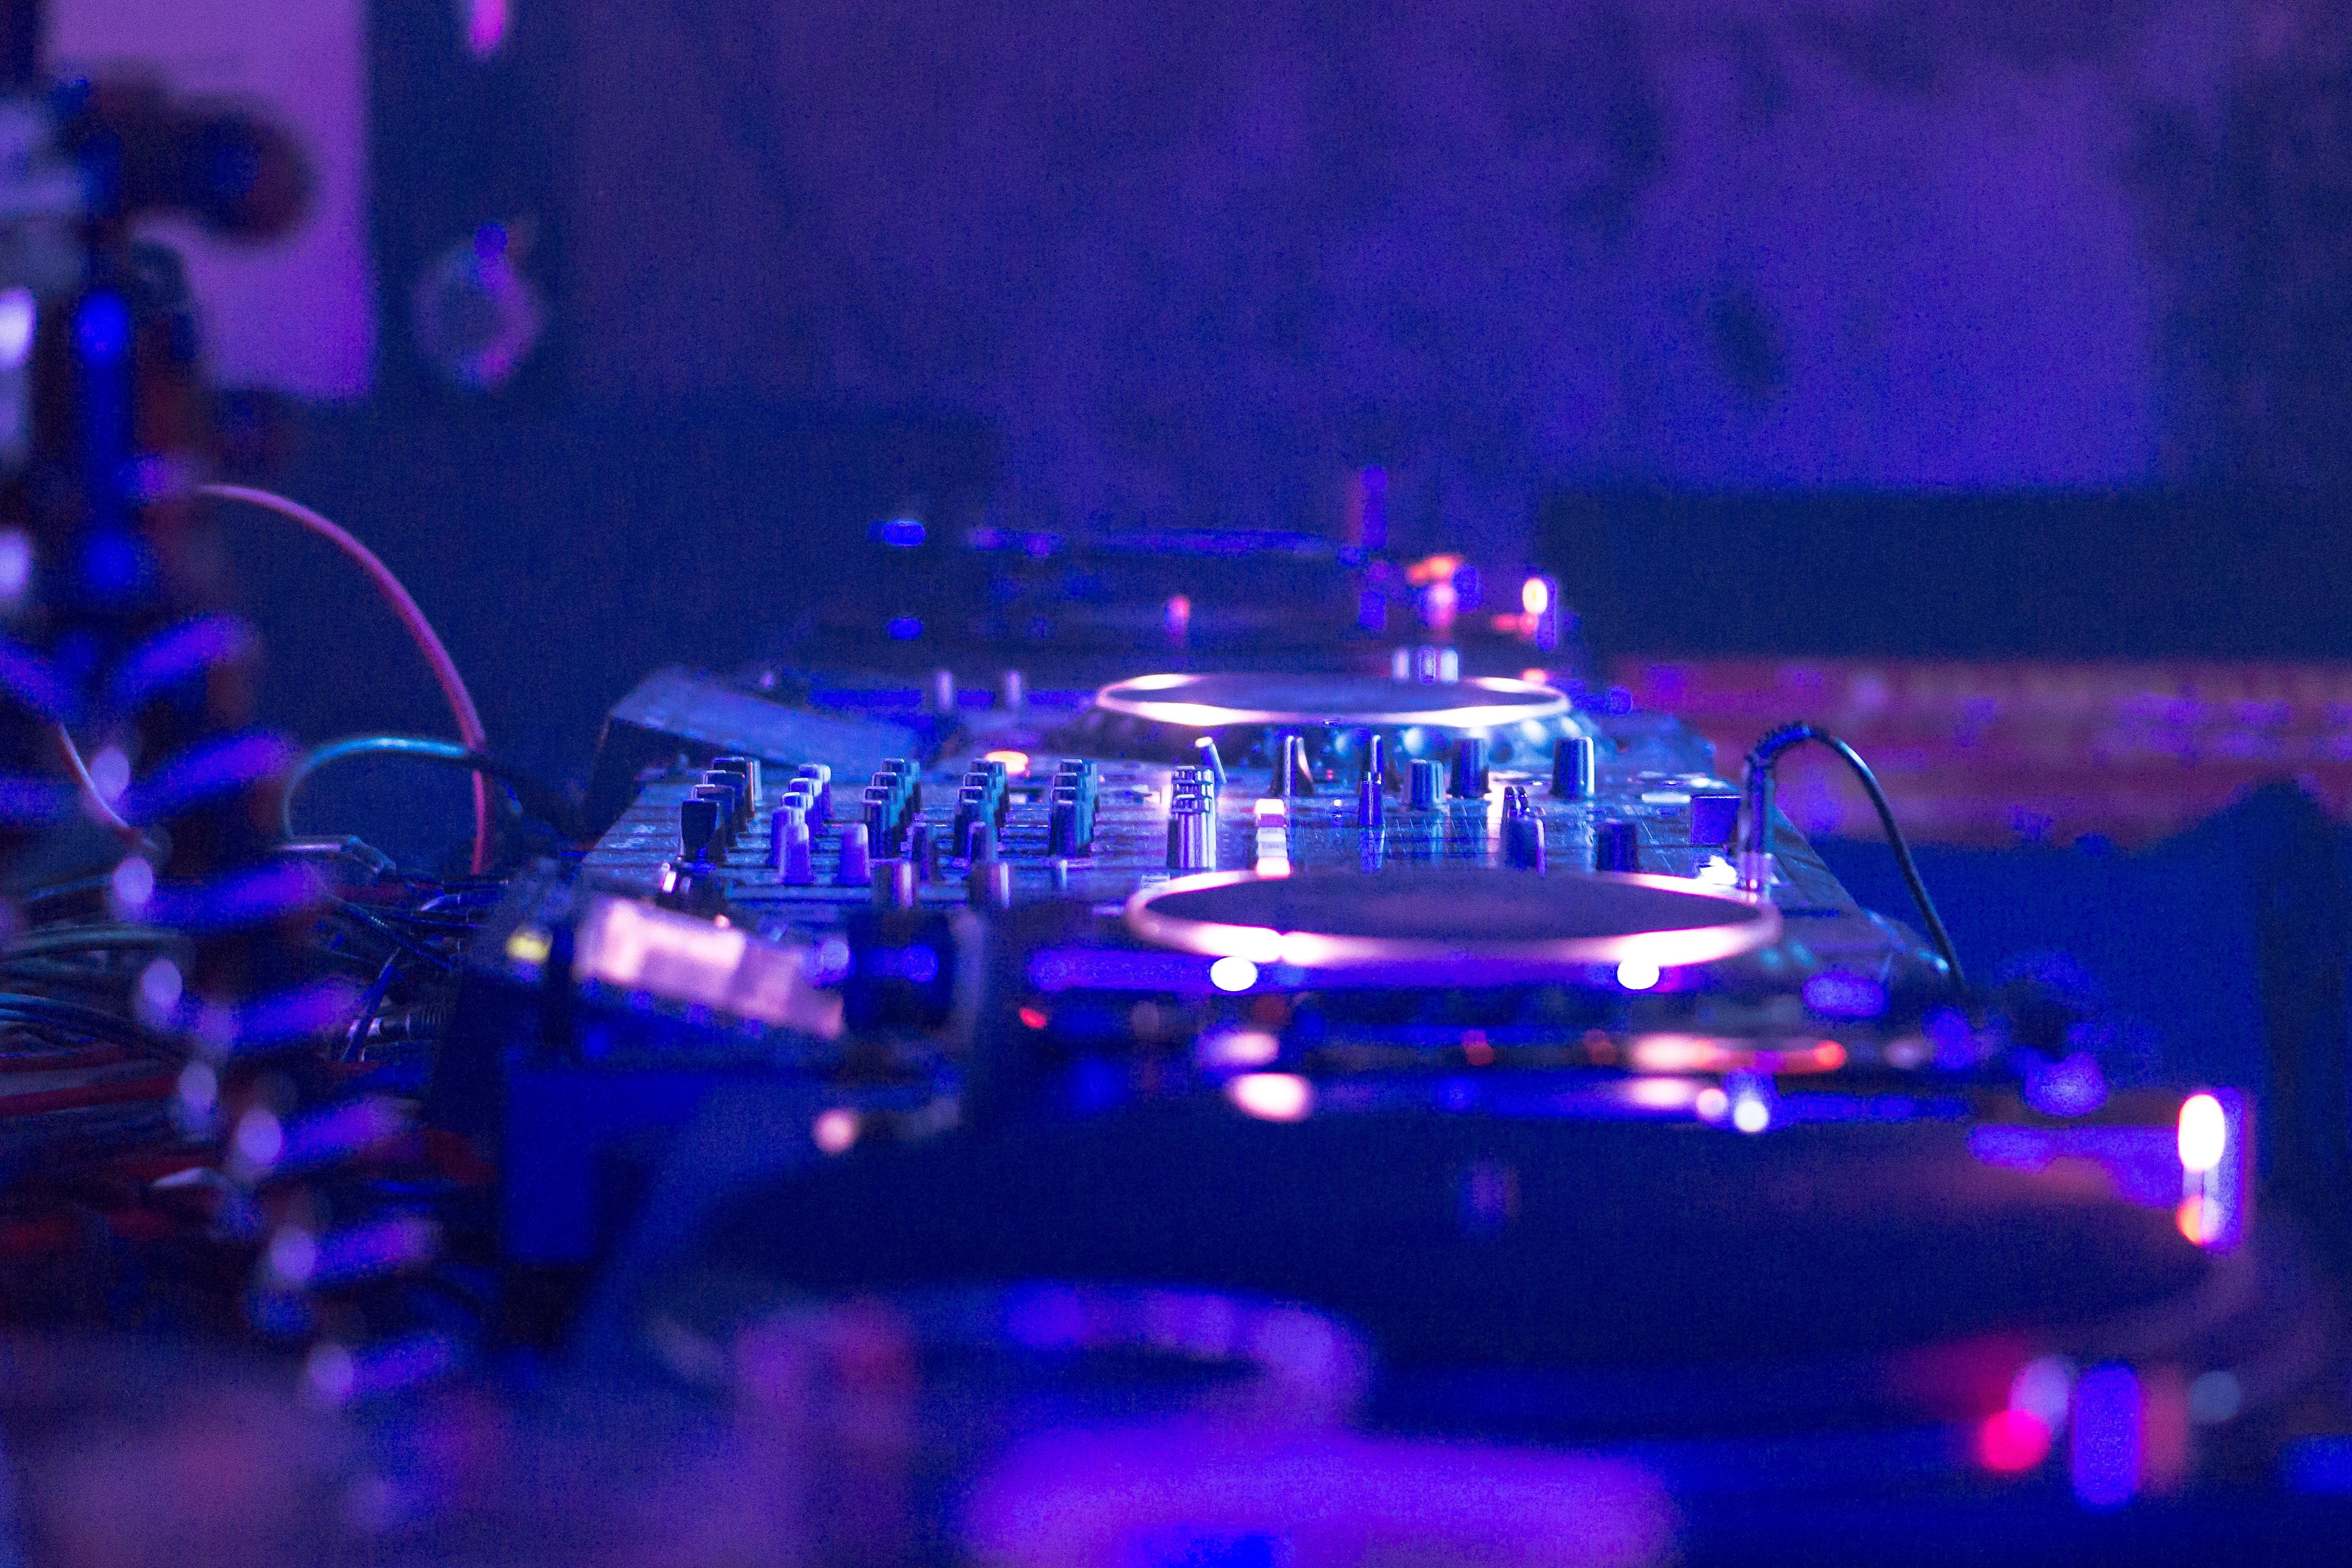 DJ controller in dimmed room